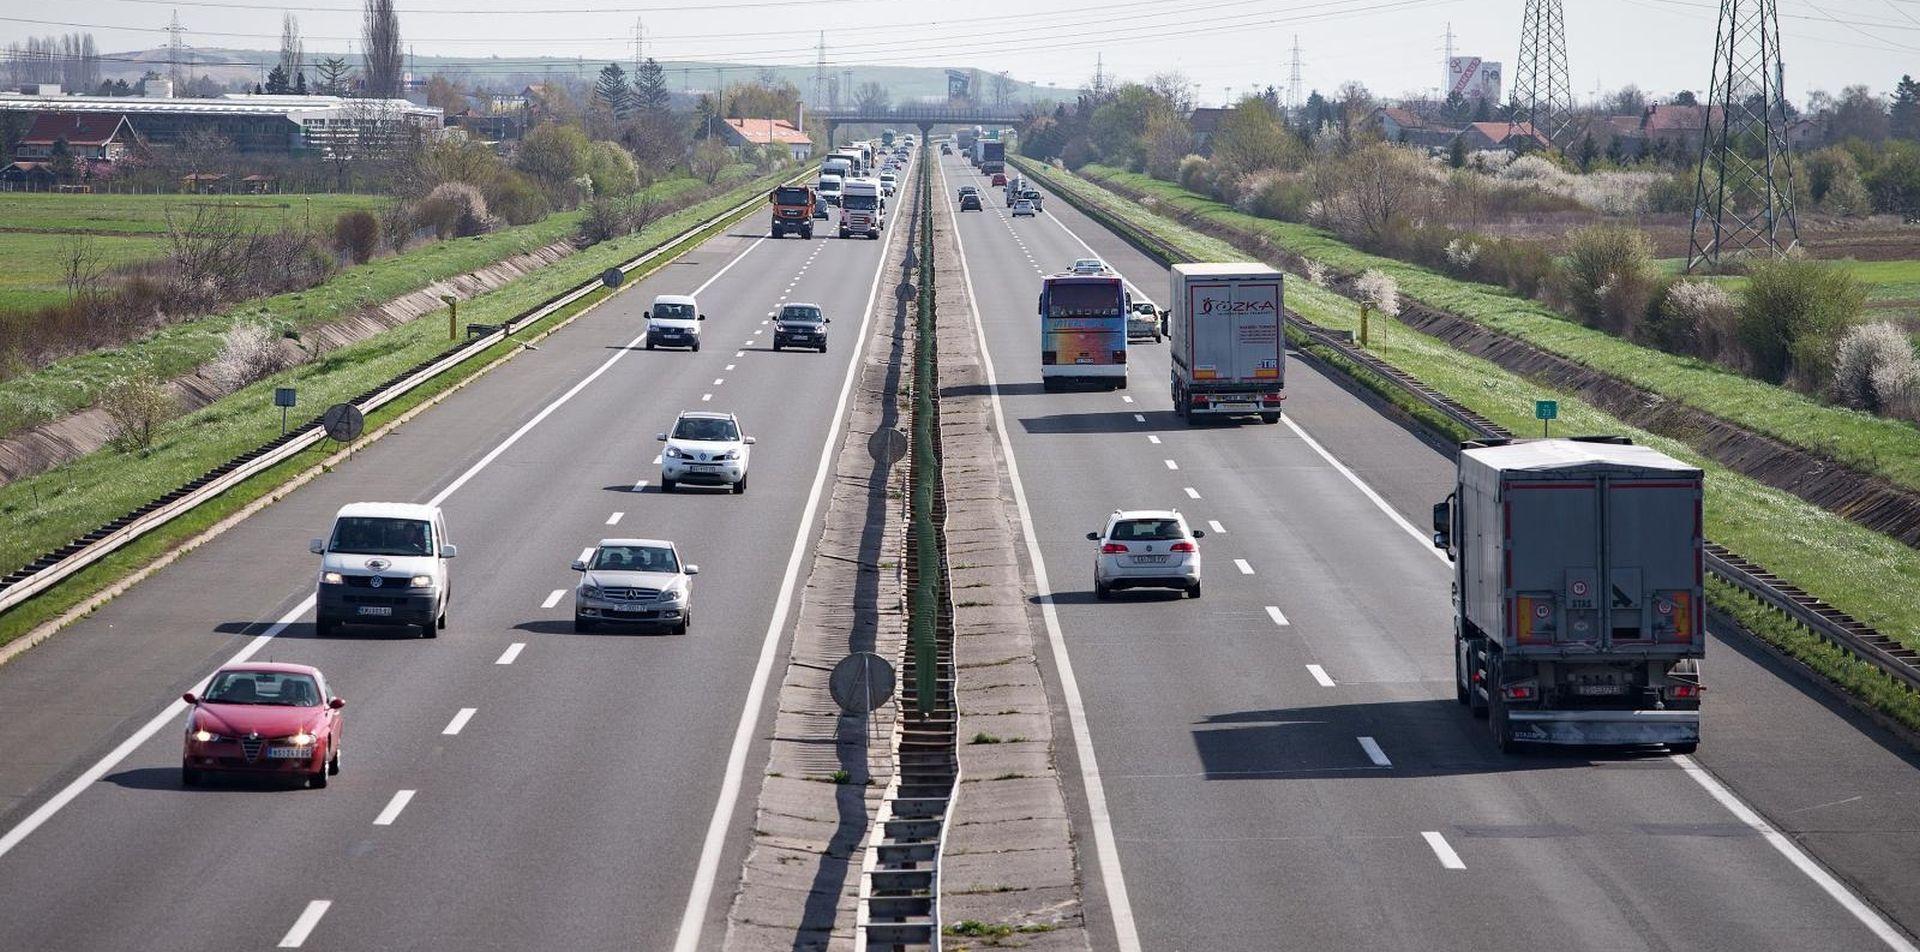 Vjetar usporava vožnju na A6, prometna na zagrebačkoj obilaznici